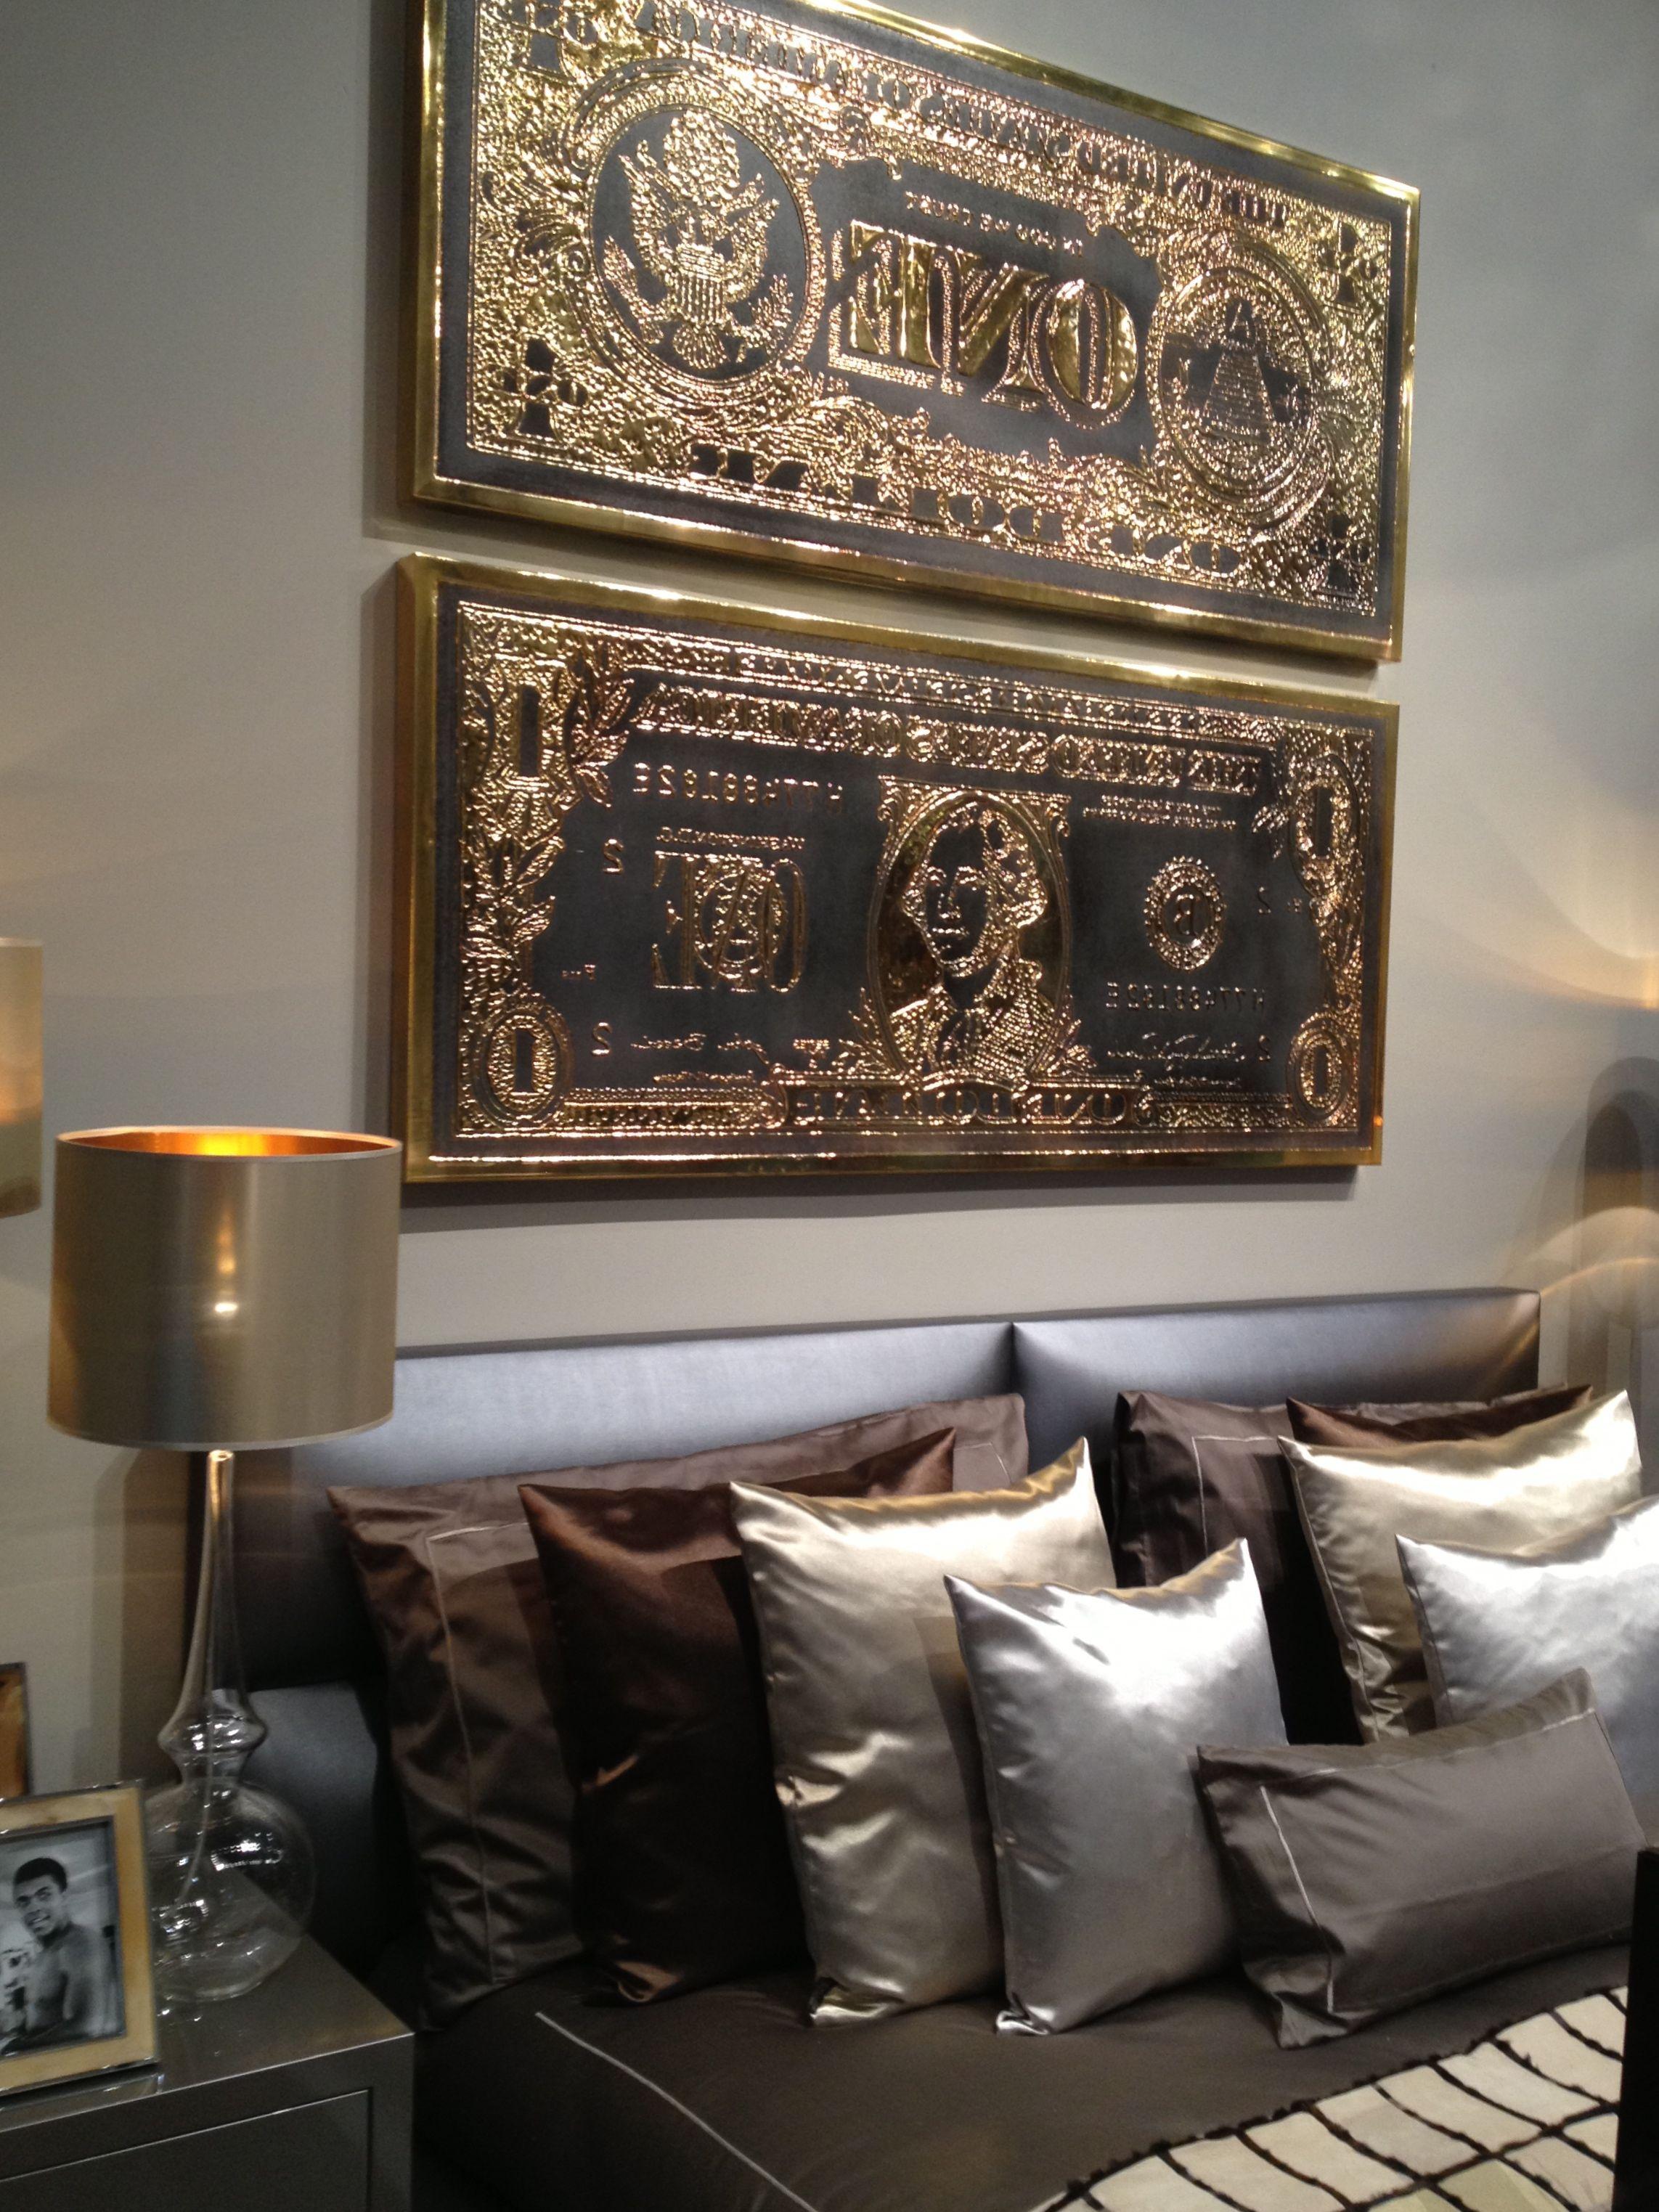 1000+ images about Interior / Interieur design on Pinterest ...